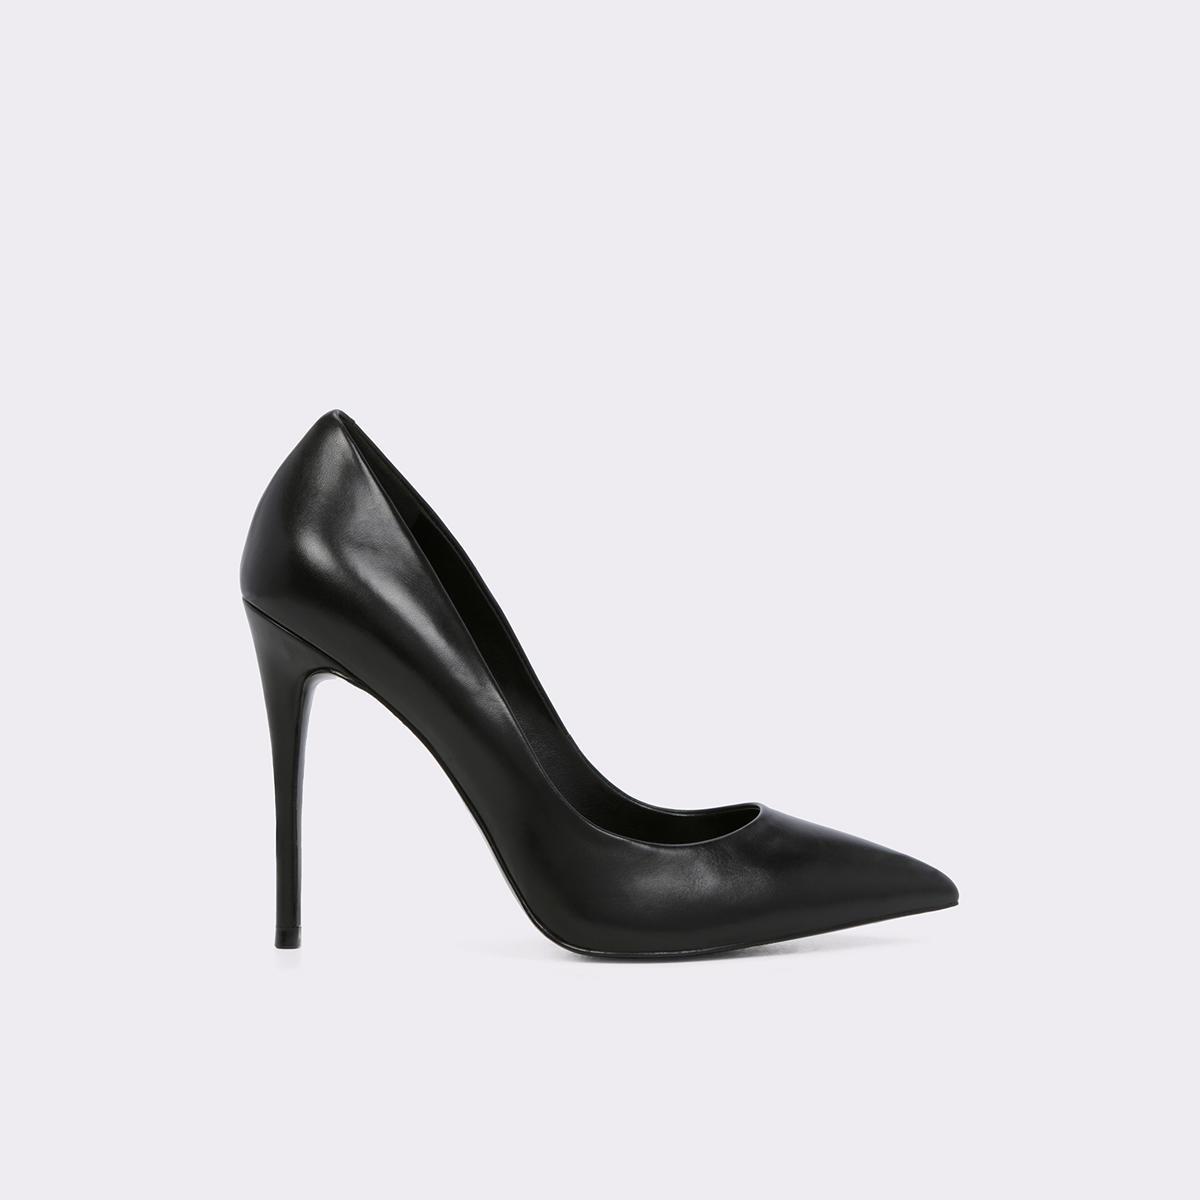 Stessy Black Women's Pumps | ALDO US at Aldo Shoes in Victor, NY | Tuggl